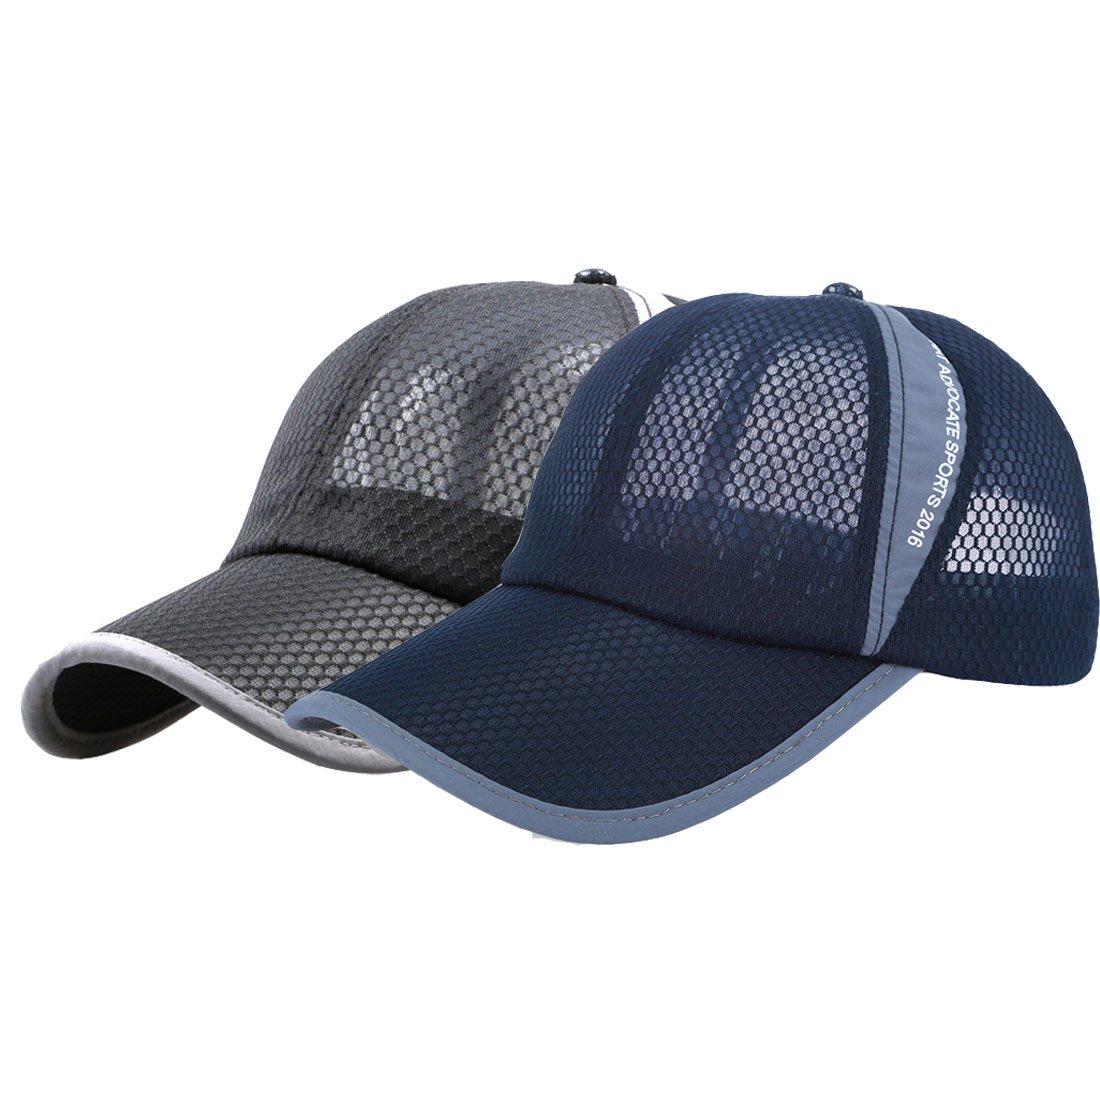 King Star 2 Pack Men Women Summer Mesh Breathable Adjustable Snapback Baseball Cap Sports Hat Dark Blue+Black